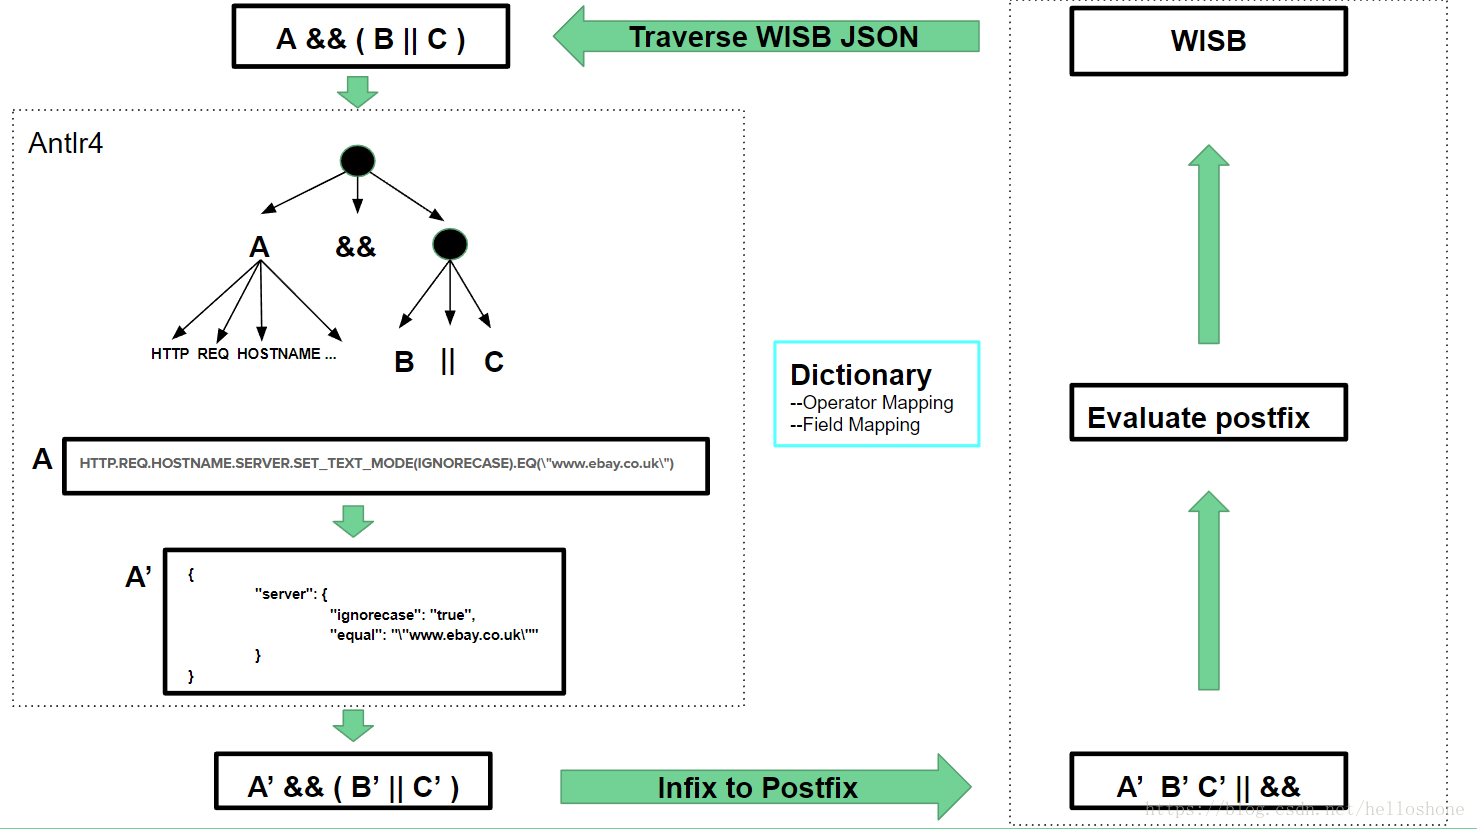 Ebay S Practice On Software Loadbalancer Programmer Sought